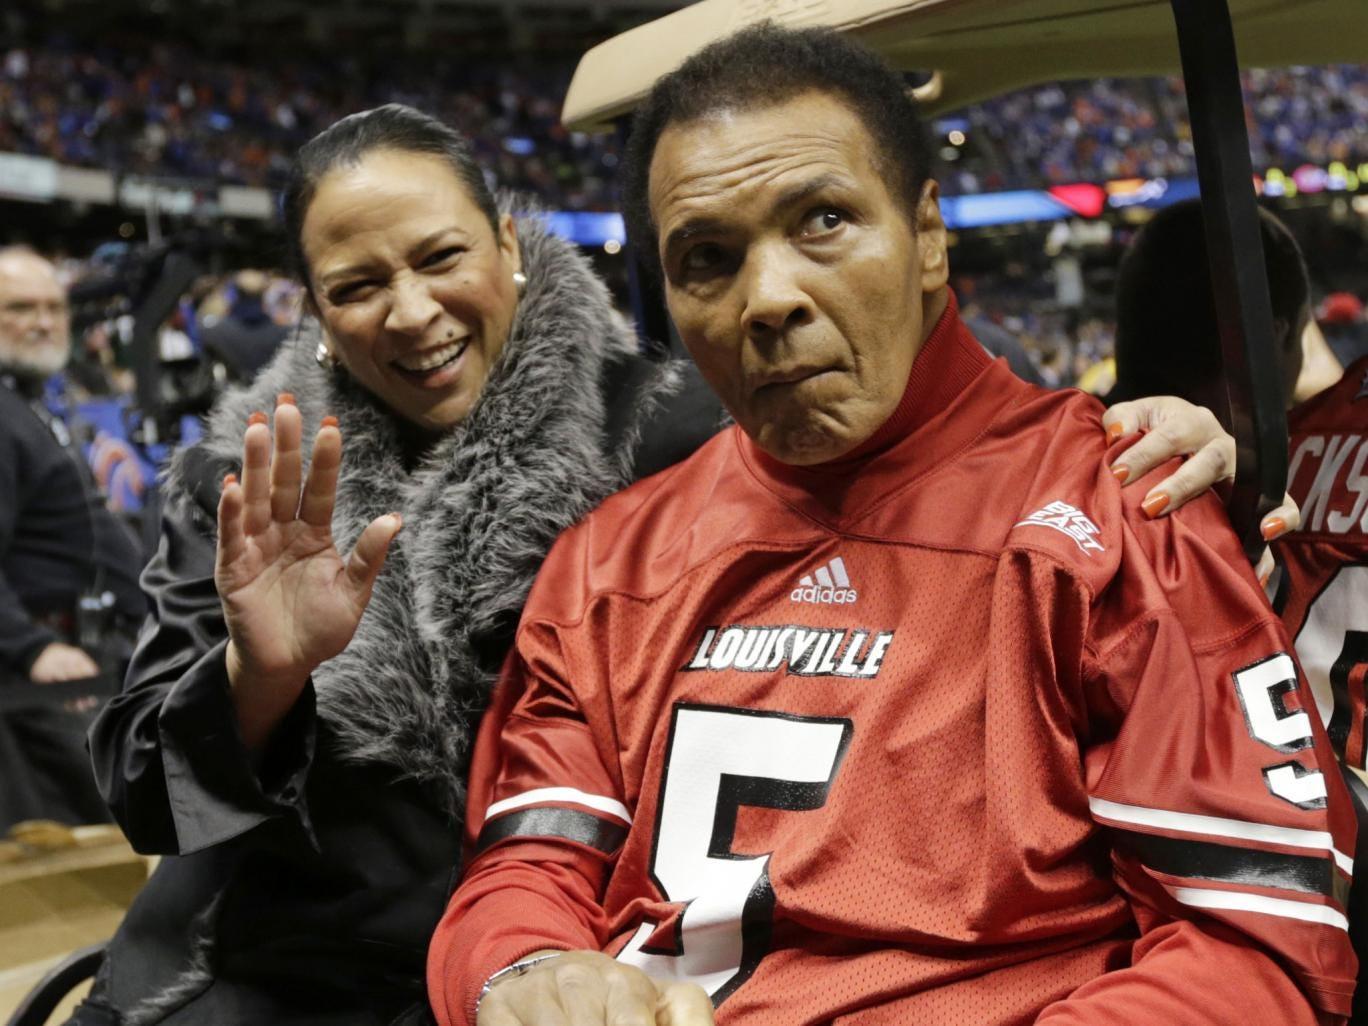 Former boxing legend Muhammad Ali